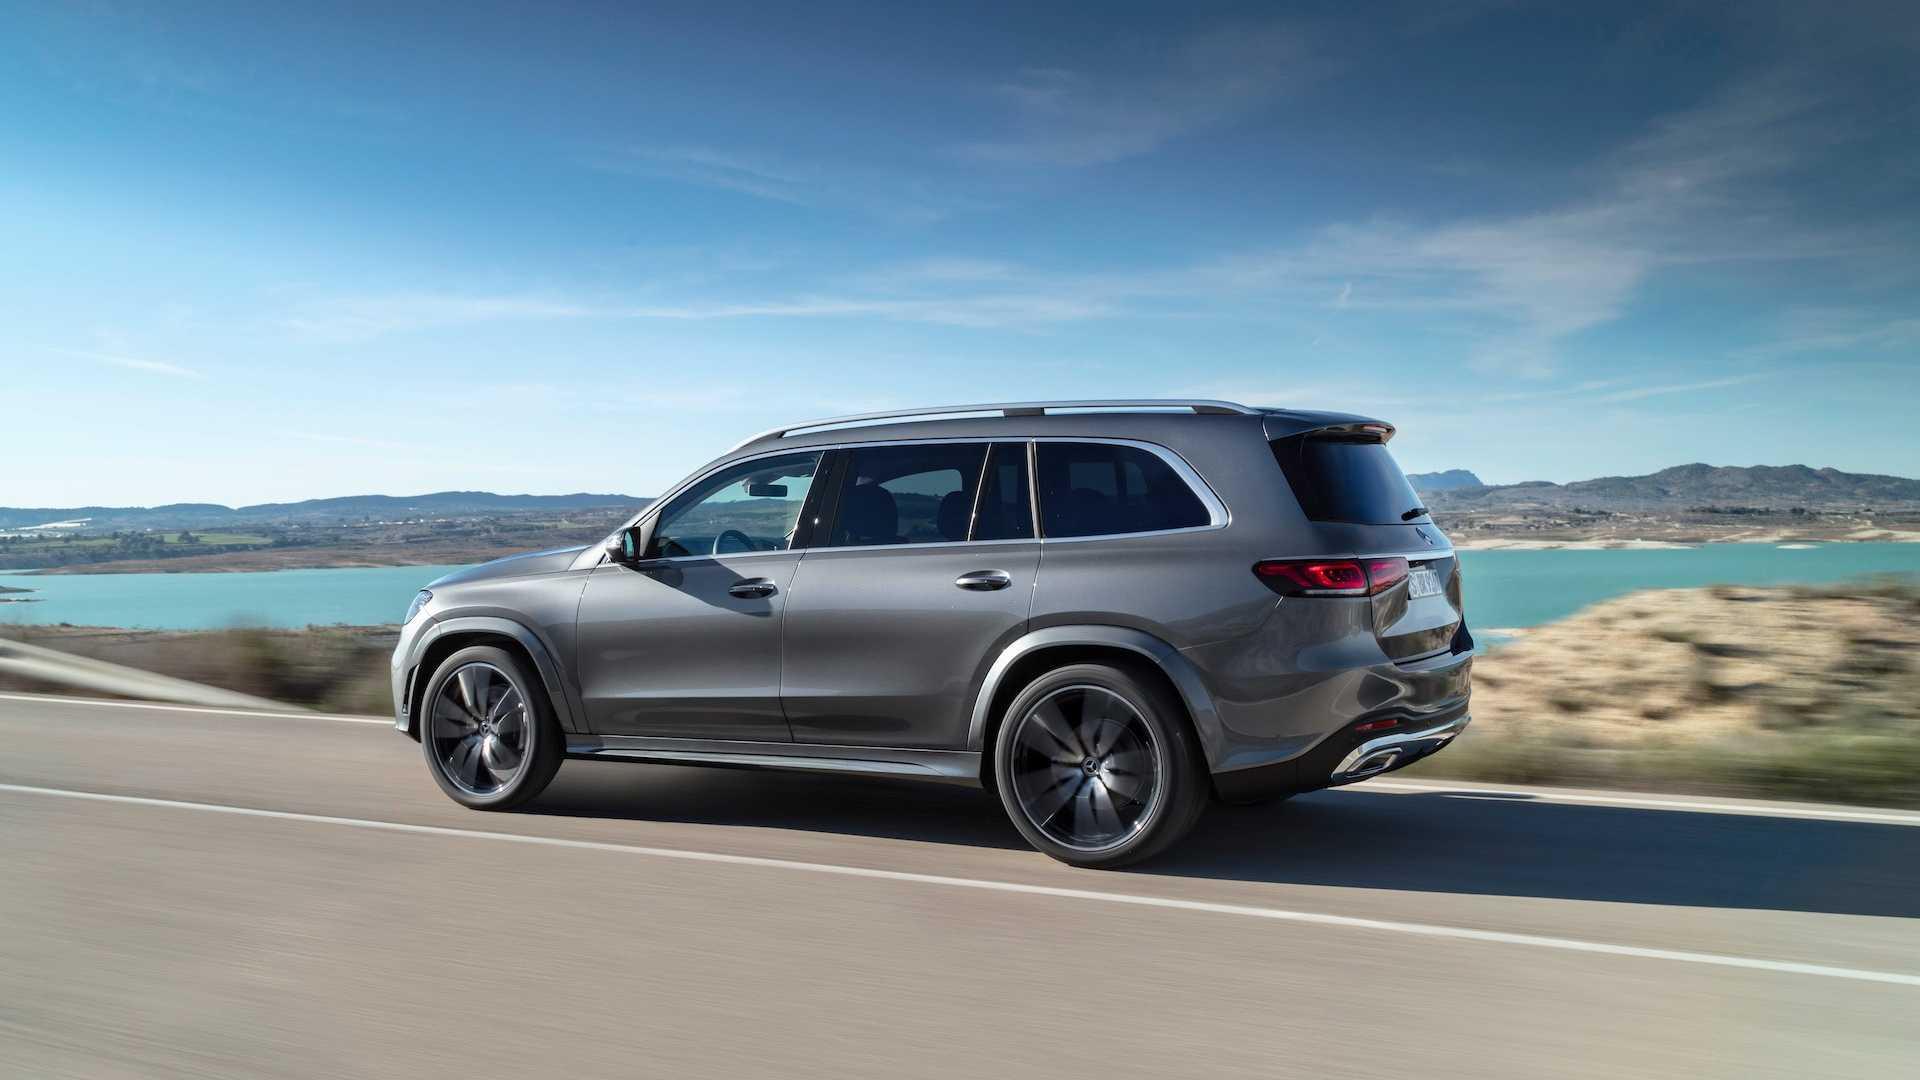 2020 Mercedes-Benz GLS AMG Line (Color: Designo Selenite Grey Metallic) Side Wallpapers (10)